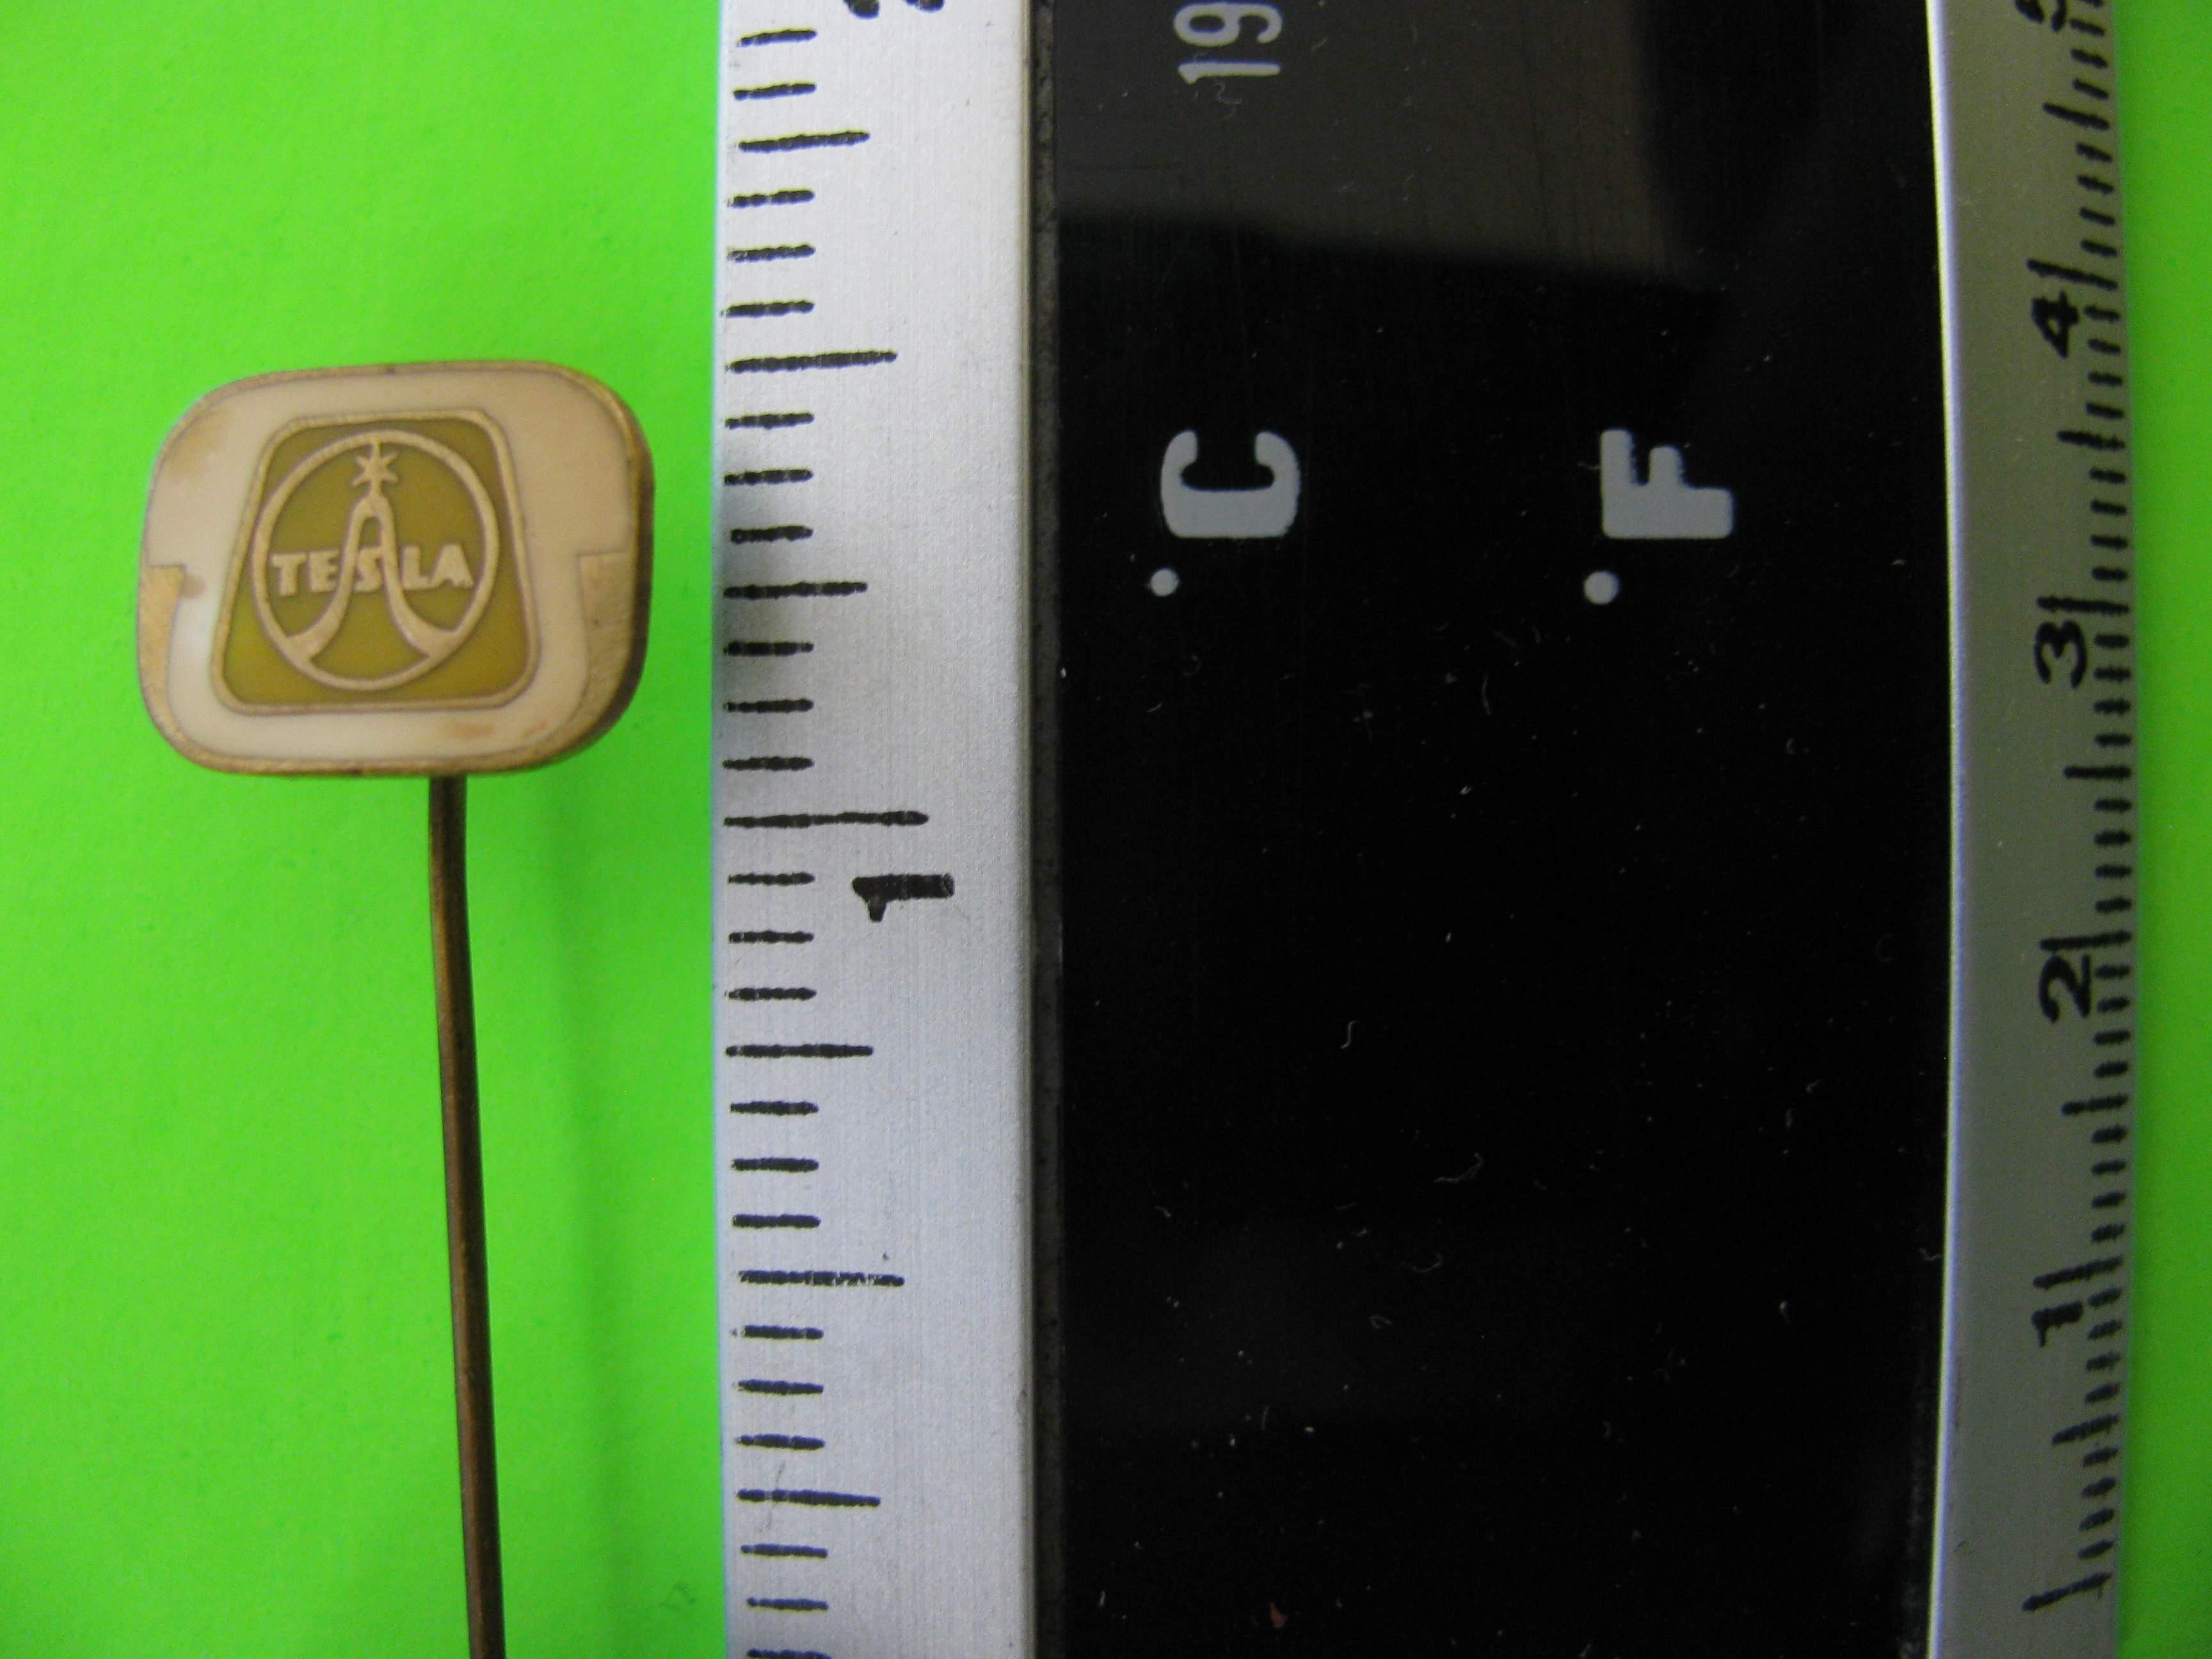 Vintage Tesla Stick Pin, Metal with Cream Colored Telephone Background (PRAHA 7)